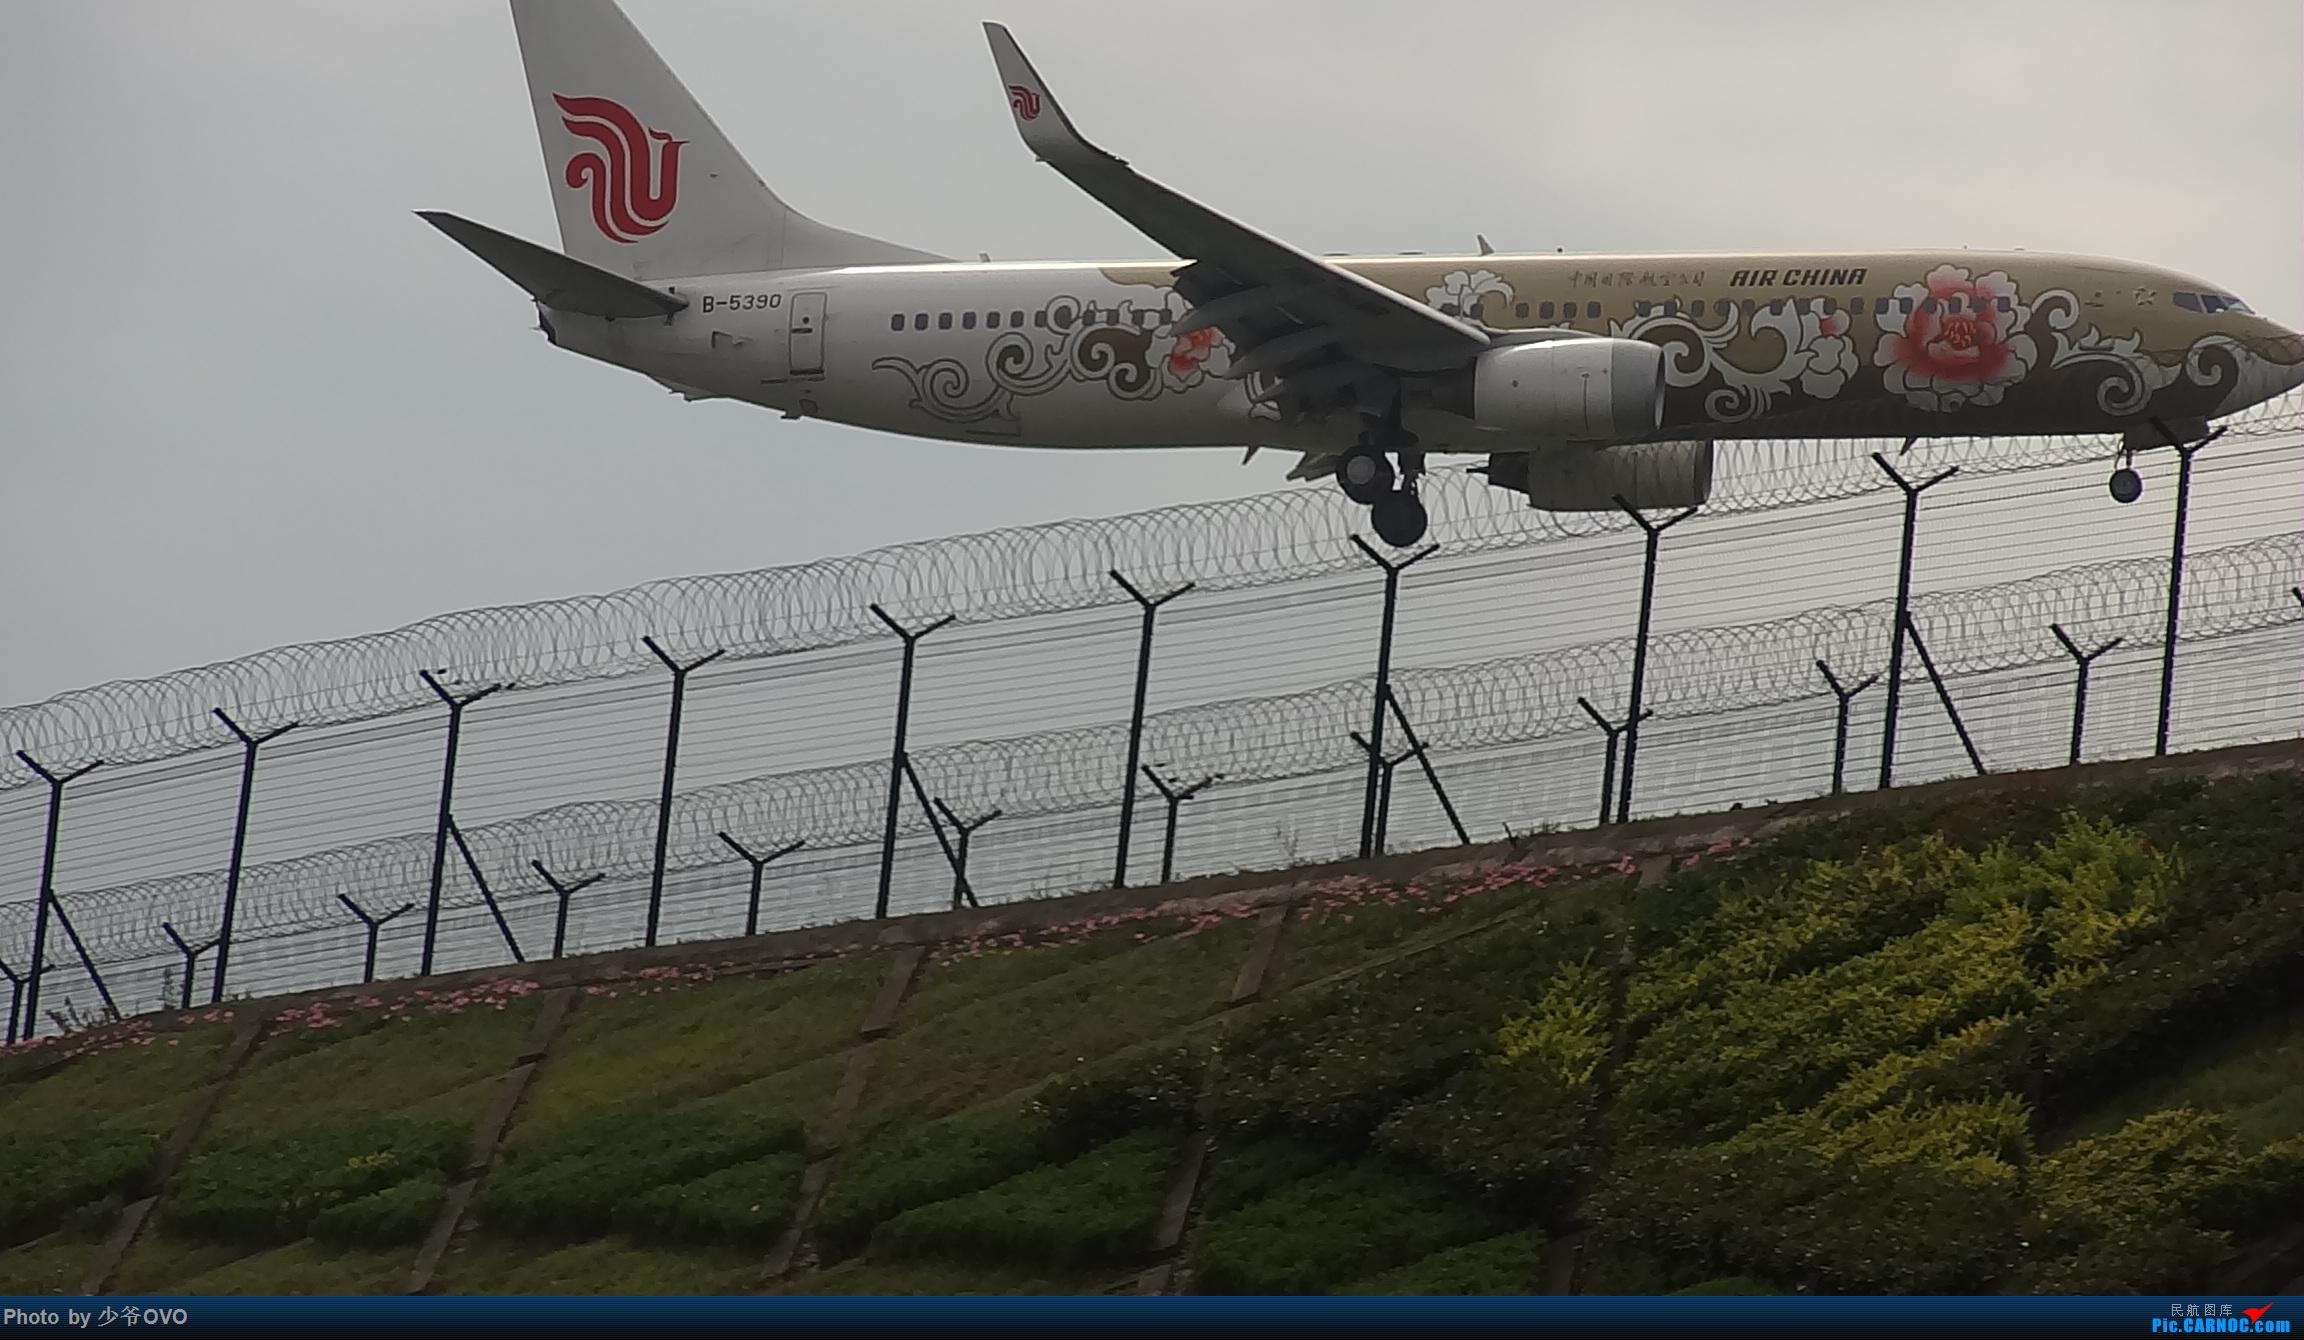 Re:[原创]CKG拍机,数码机最后的倔强 BOEING 737-800 B-5390 中国重庆江北国际机场